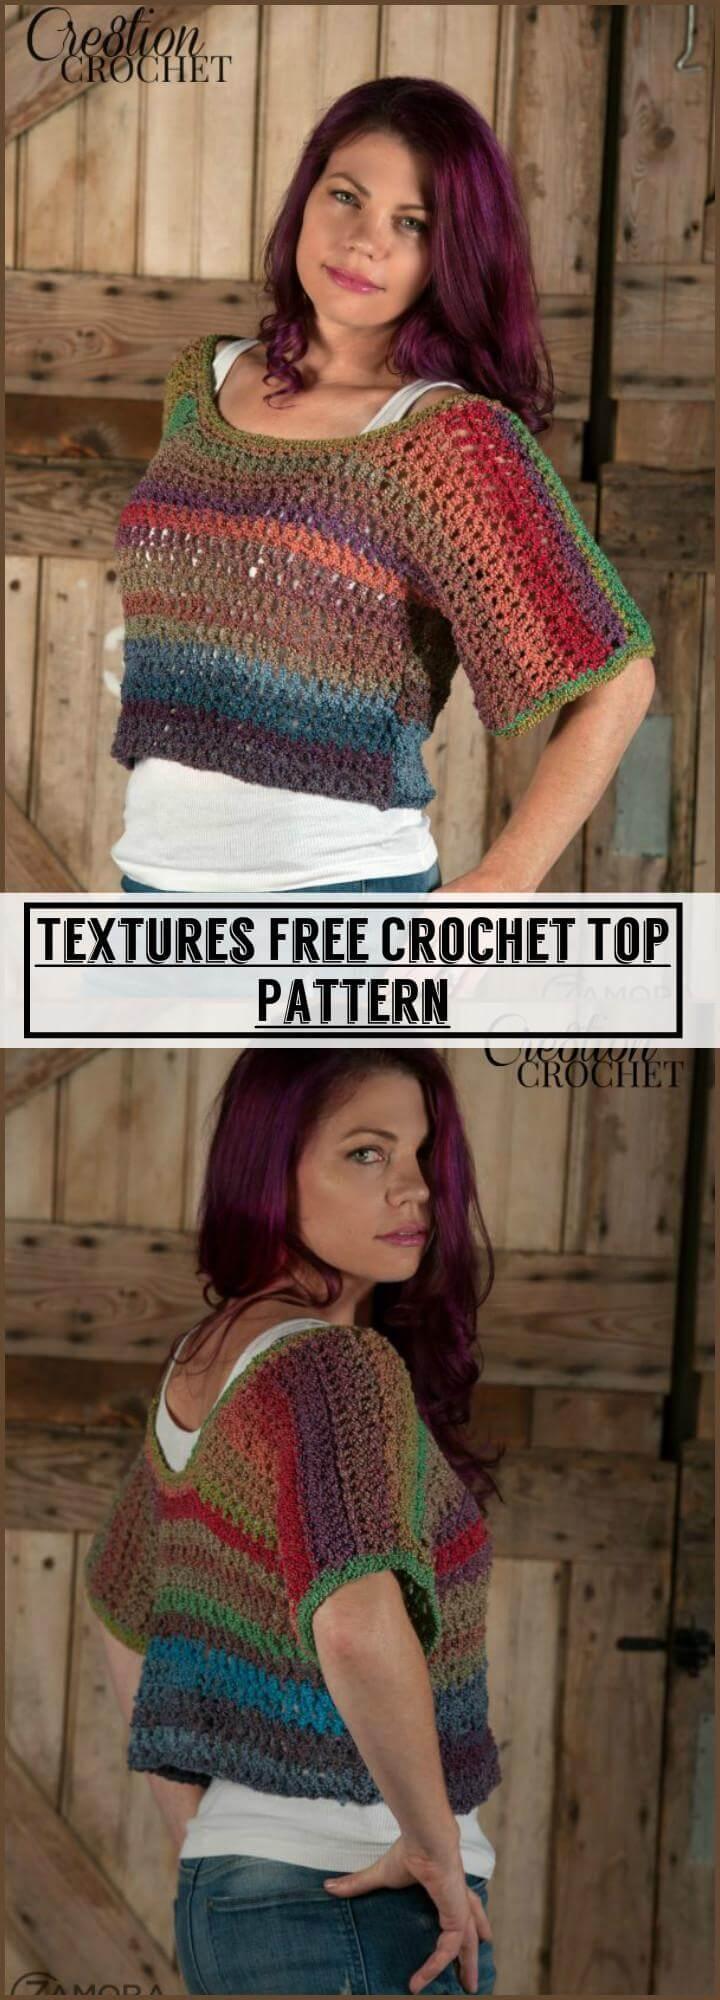 Textures Free Crochet Top Pattern